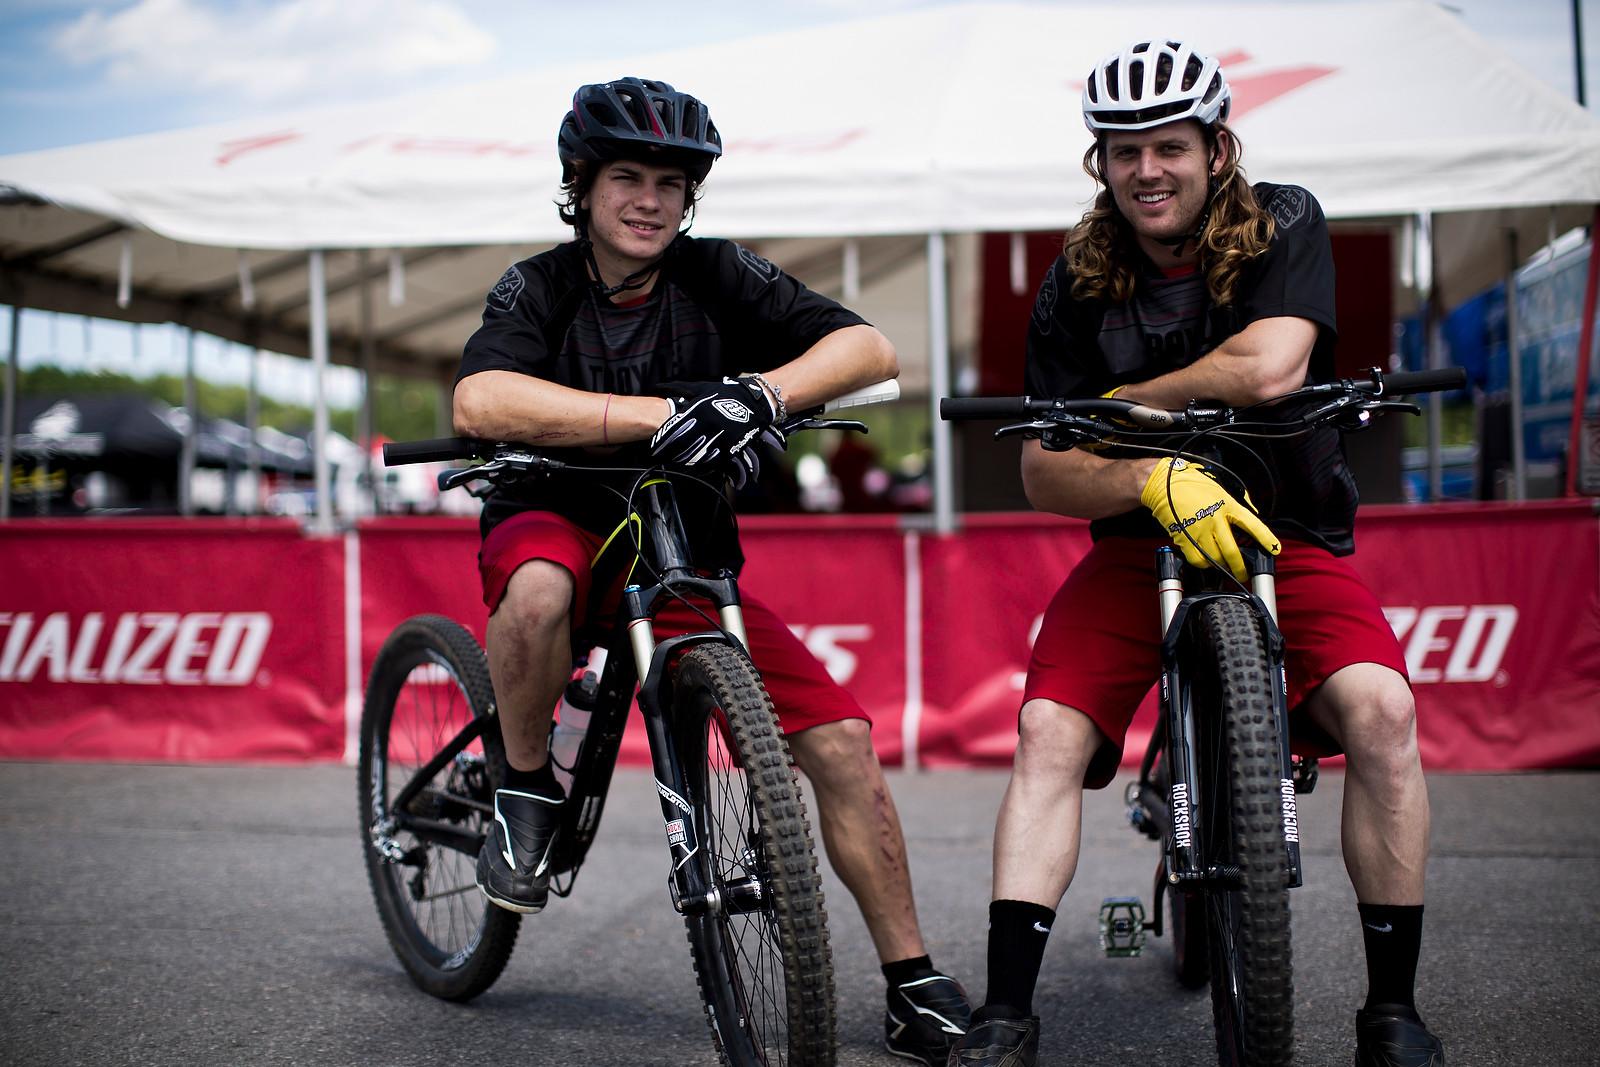 Mitch Ropelato and Brad Benedict in Mont Sainte Anne - 2012 UCI World Cup, Mont Sainte Anne, Day 1 - Mountain Biking Pictures - Vital MTB